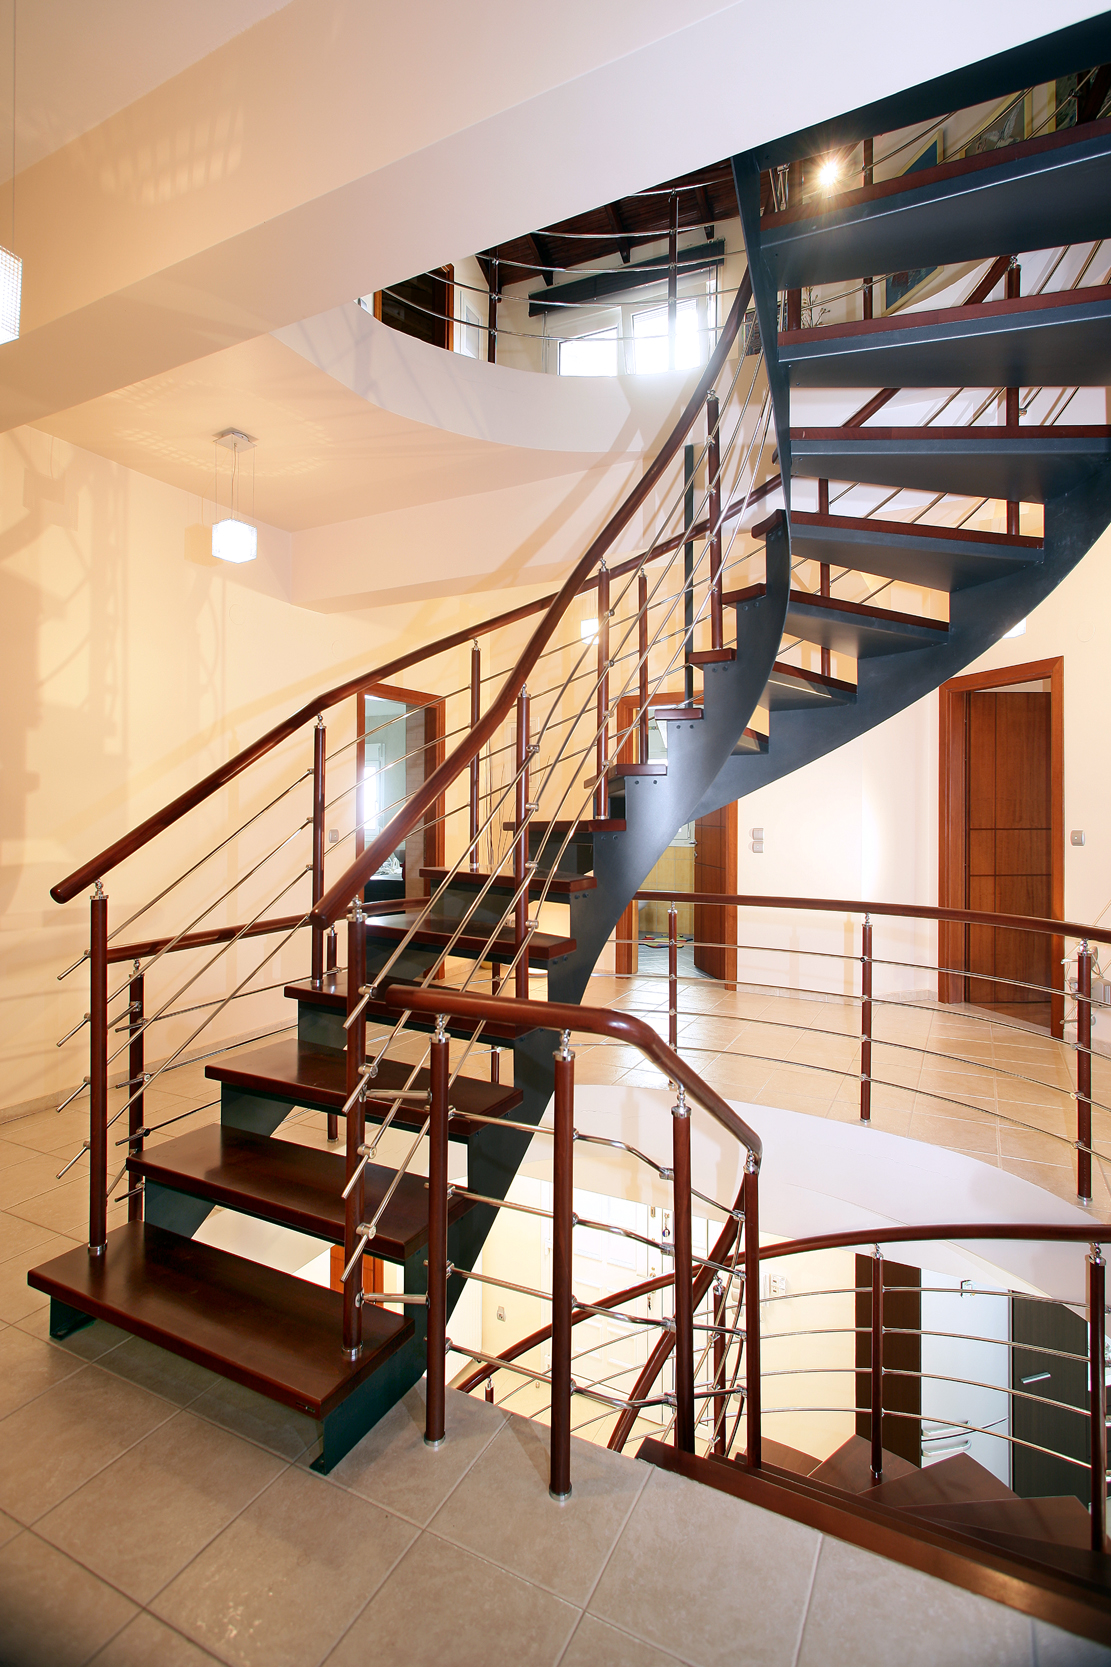 Лестница на металлическом каркасе в интерьере дома